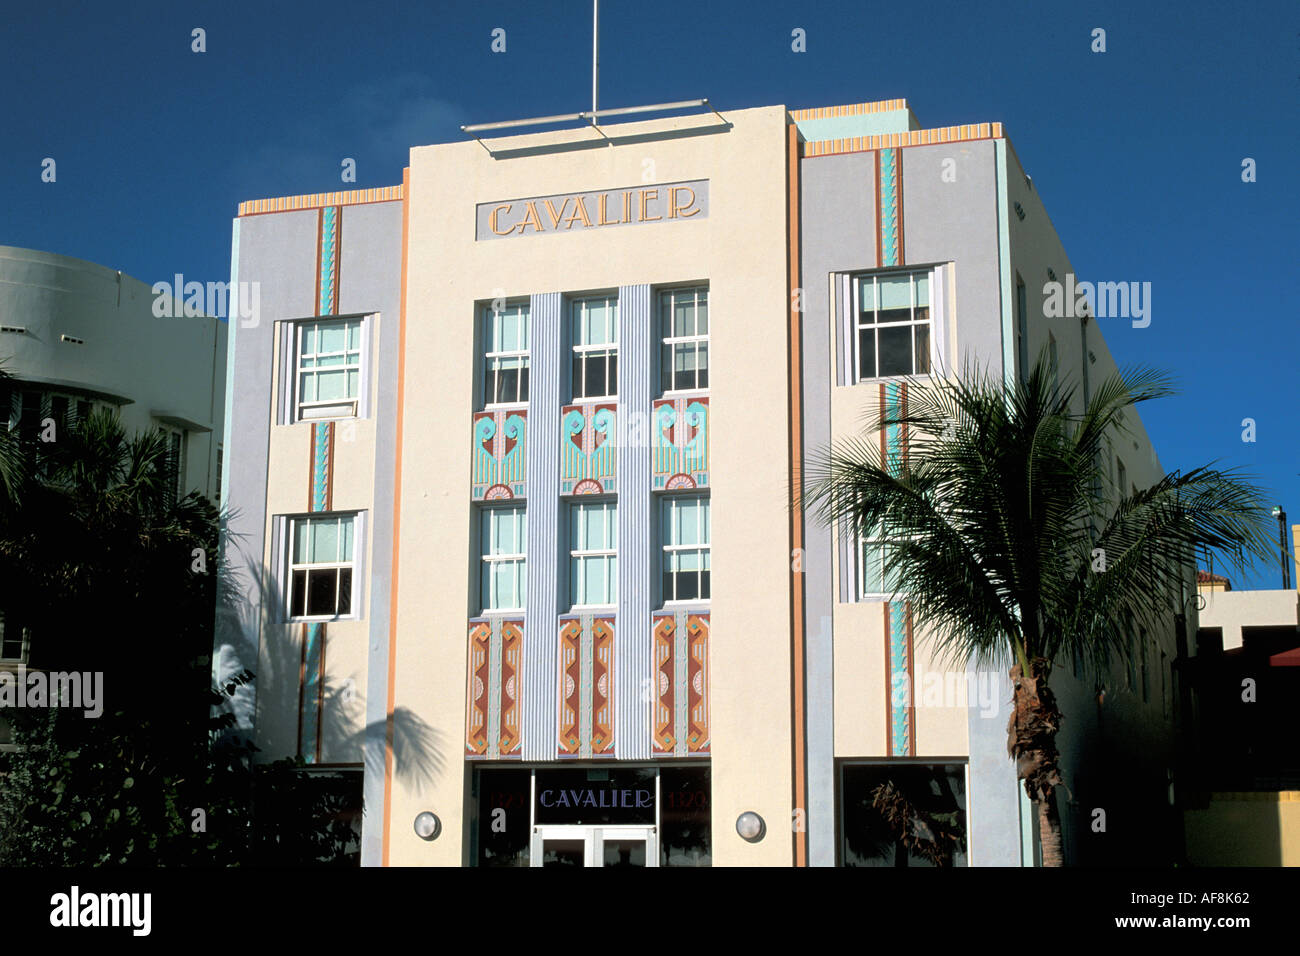 Miami Florida FL South Beach Art Deco Architecture Cavalier Hotel Front - Stock Image